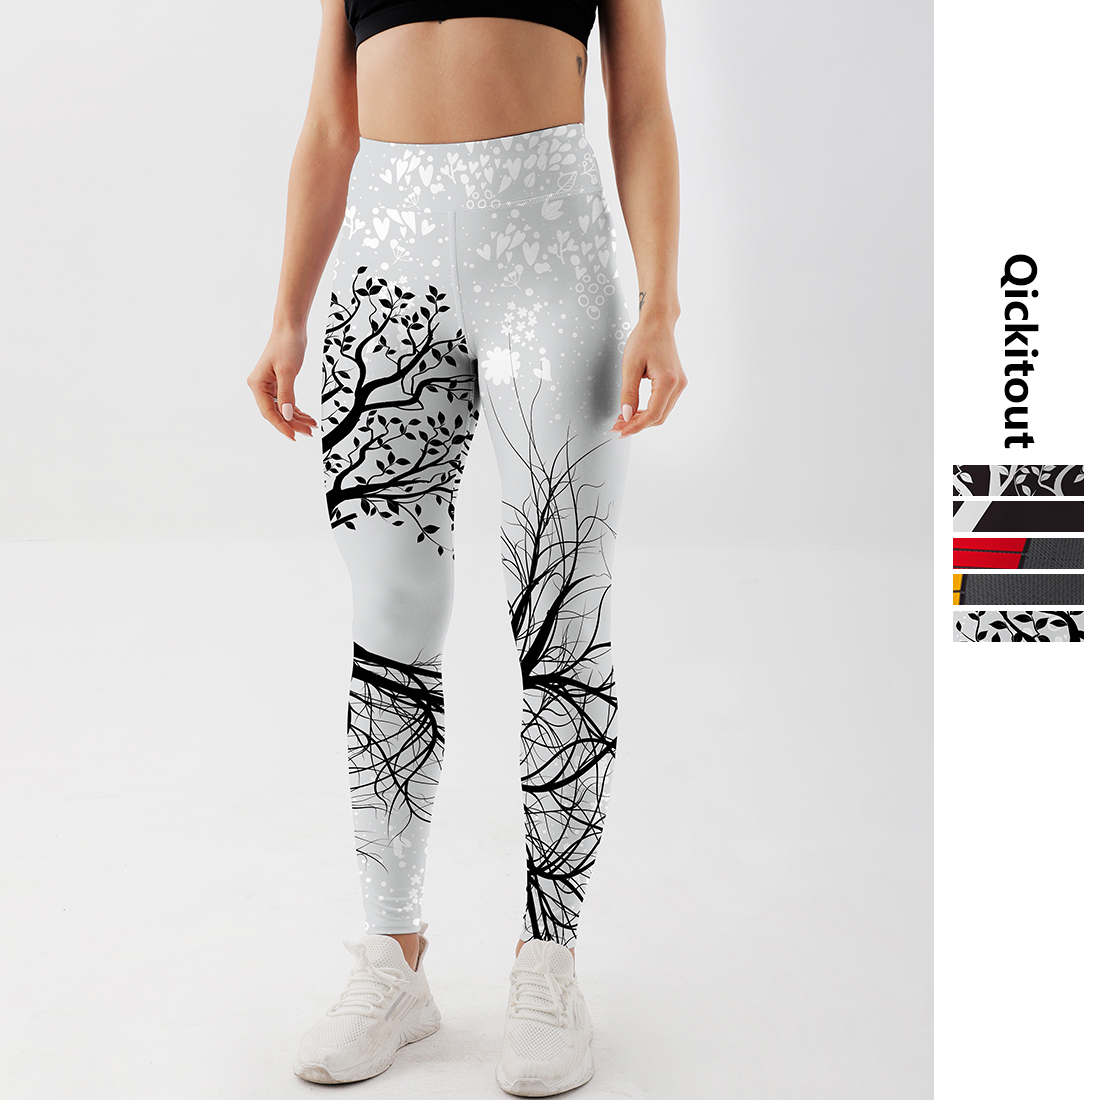 Qickitout Leggings Hot Sell Women's Skull&flower Black Leggings Digital Print Pants Trousers Stretch Pants Plus Size|leggings hot|black leggingsleggings plus - AliExpress